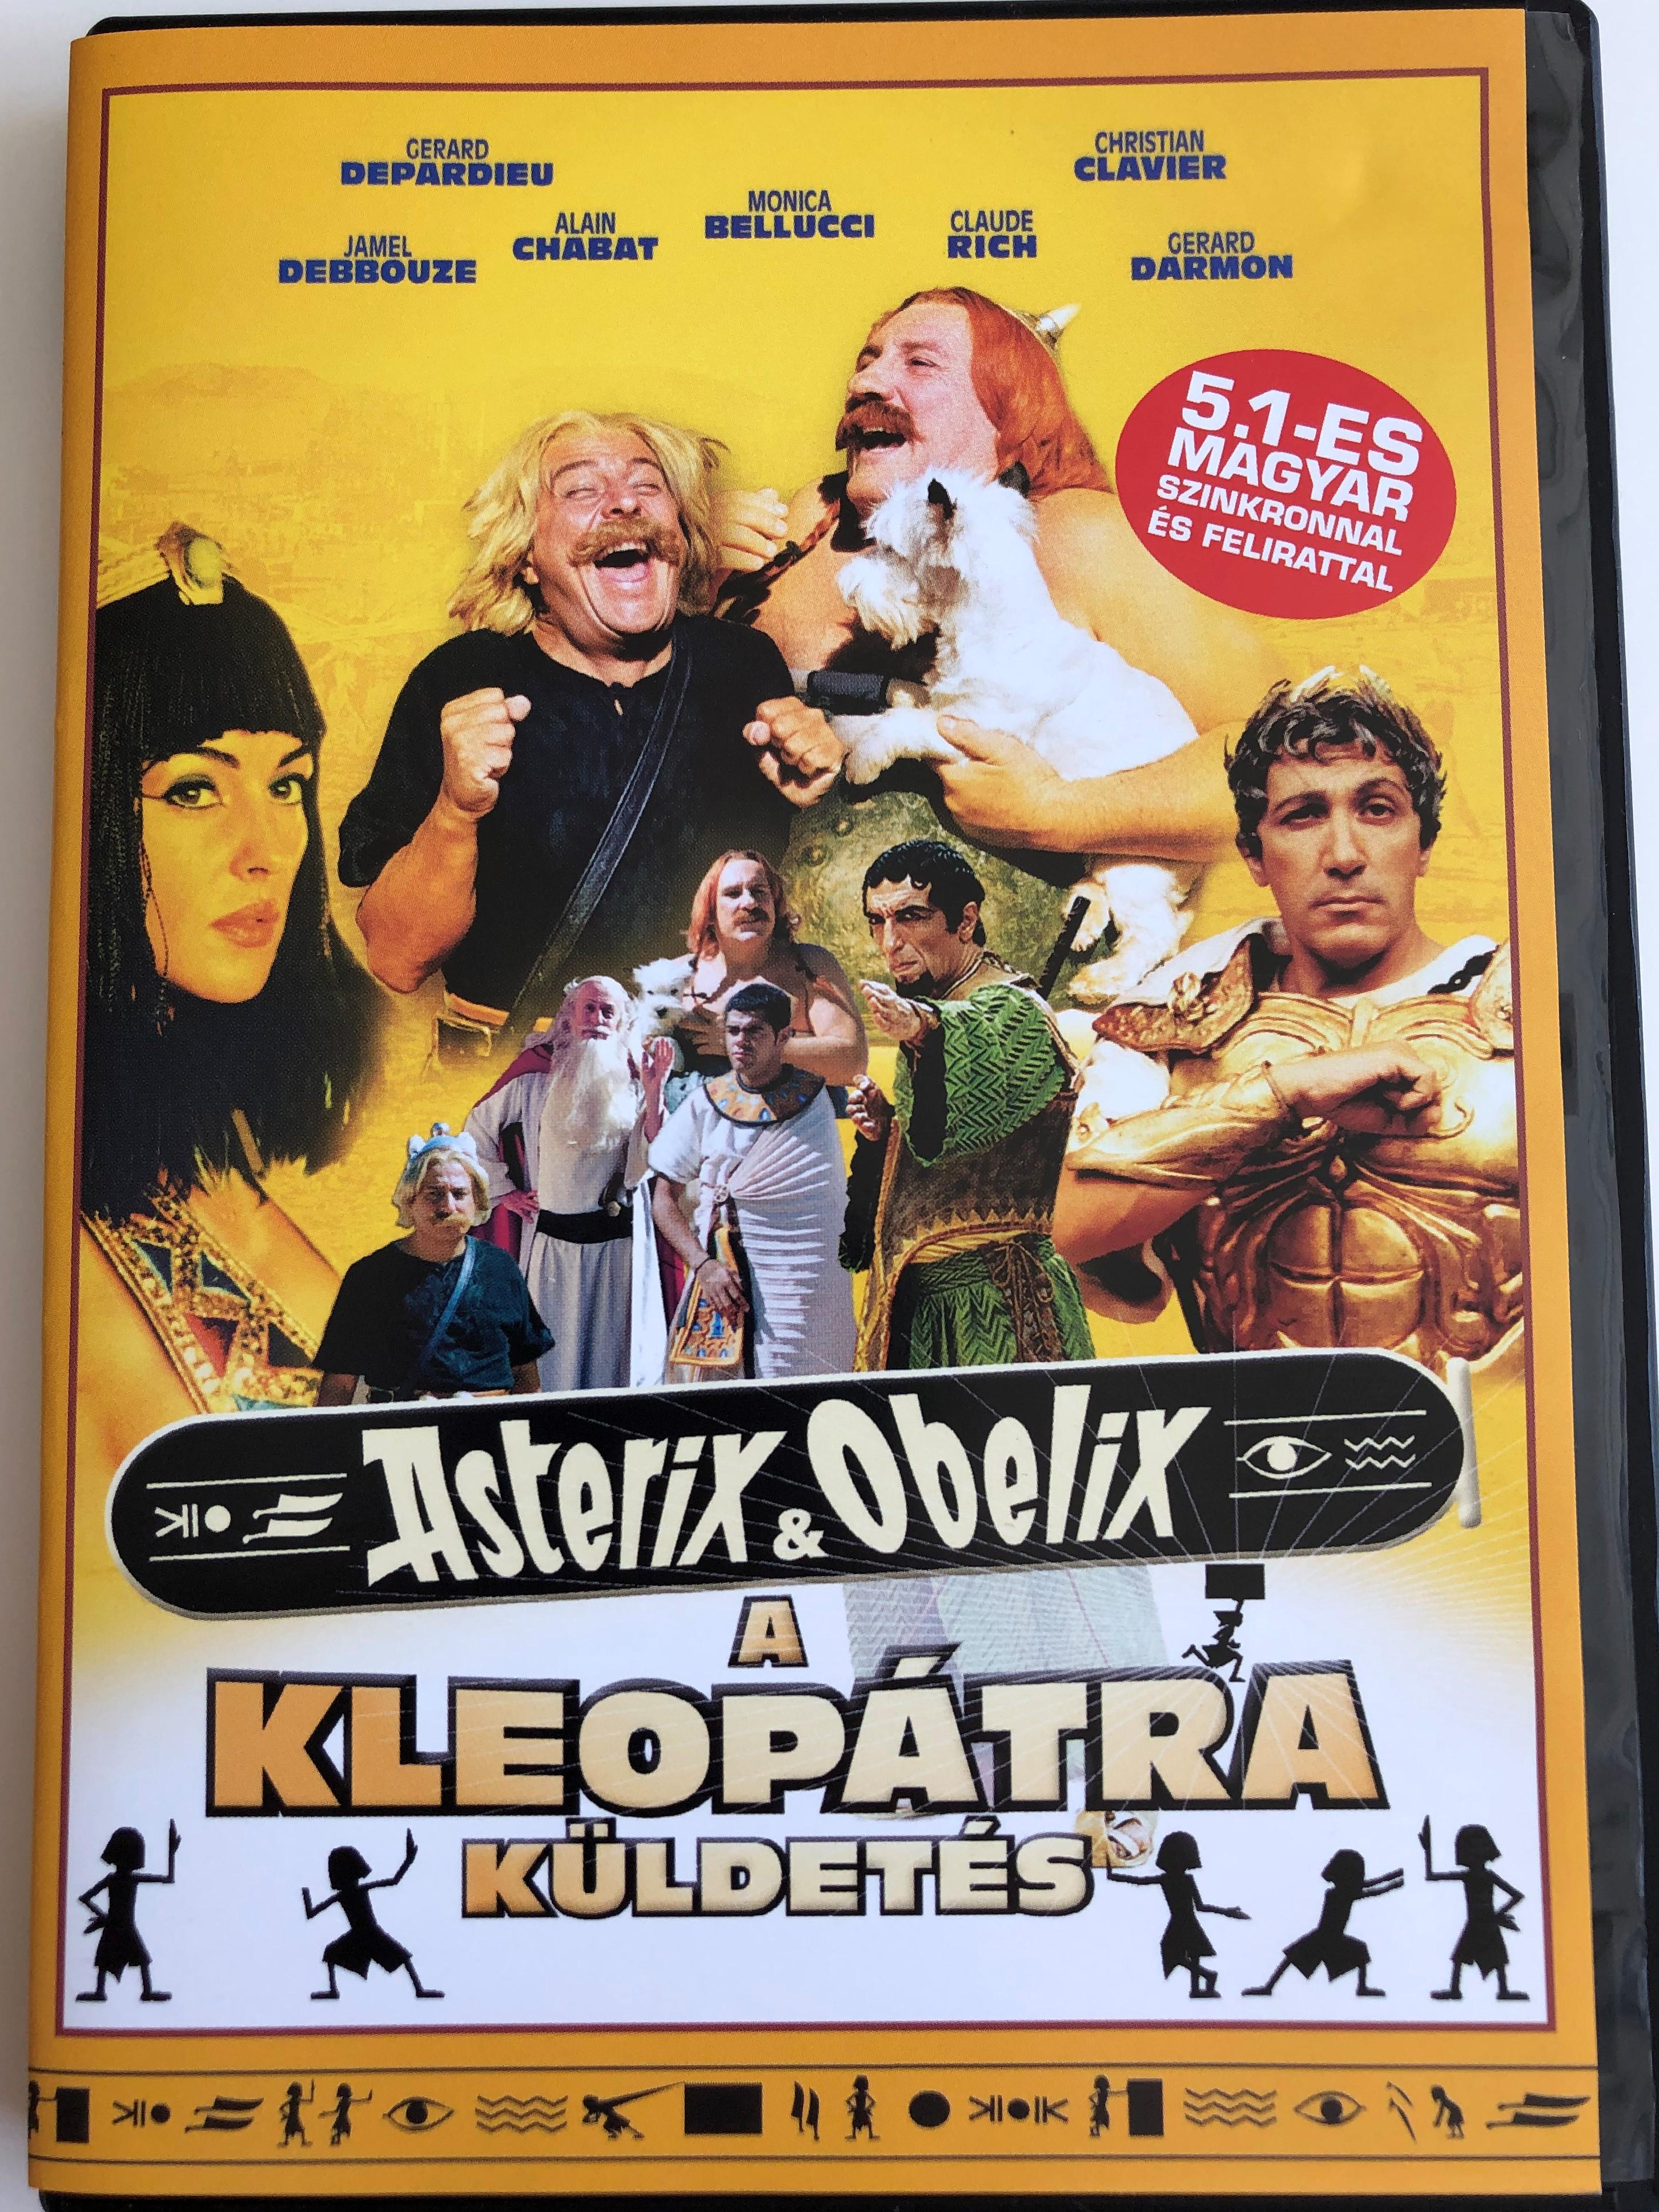 ast-rix-et-ob-lix-mission-cl-op-tre-dvd-2002-asterix-obelix-a-kleop-tra-k-ldet-s-asterix-obelix-mission-cleopatra-directed-by-alain-chabat-starring-g-rard-depardieu-christian-clavier-jamel-debbouze-alain-chabat-mo-1-.jpg